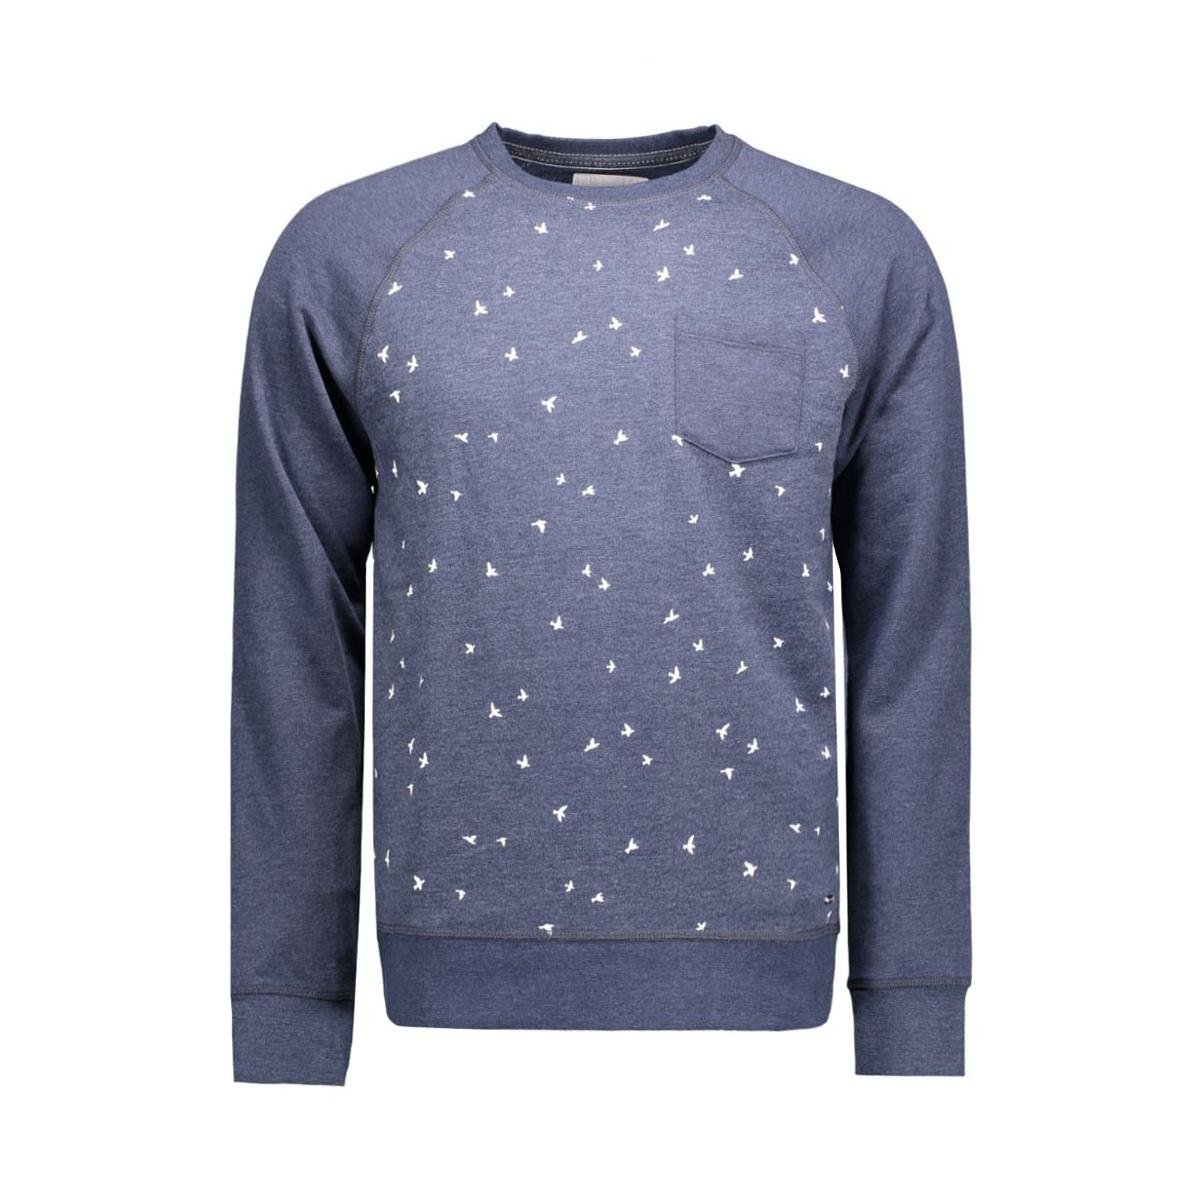 096cc2j010 edc sweater c400